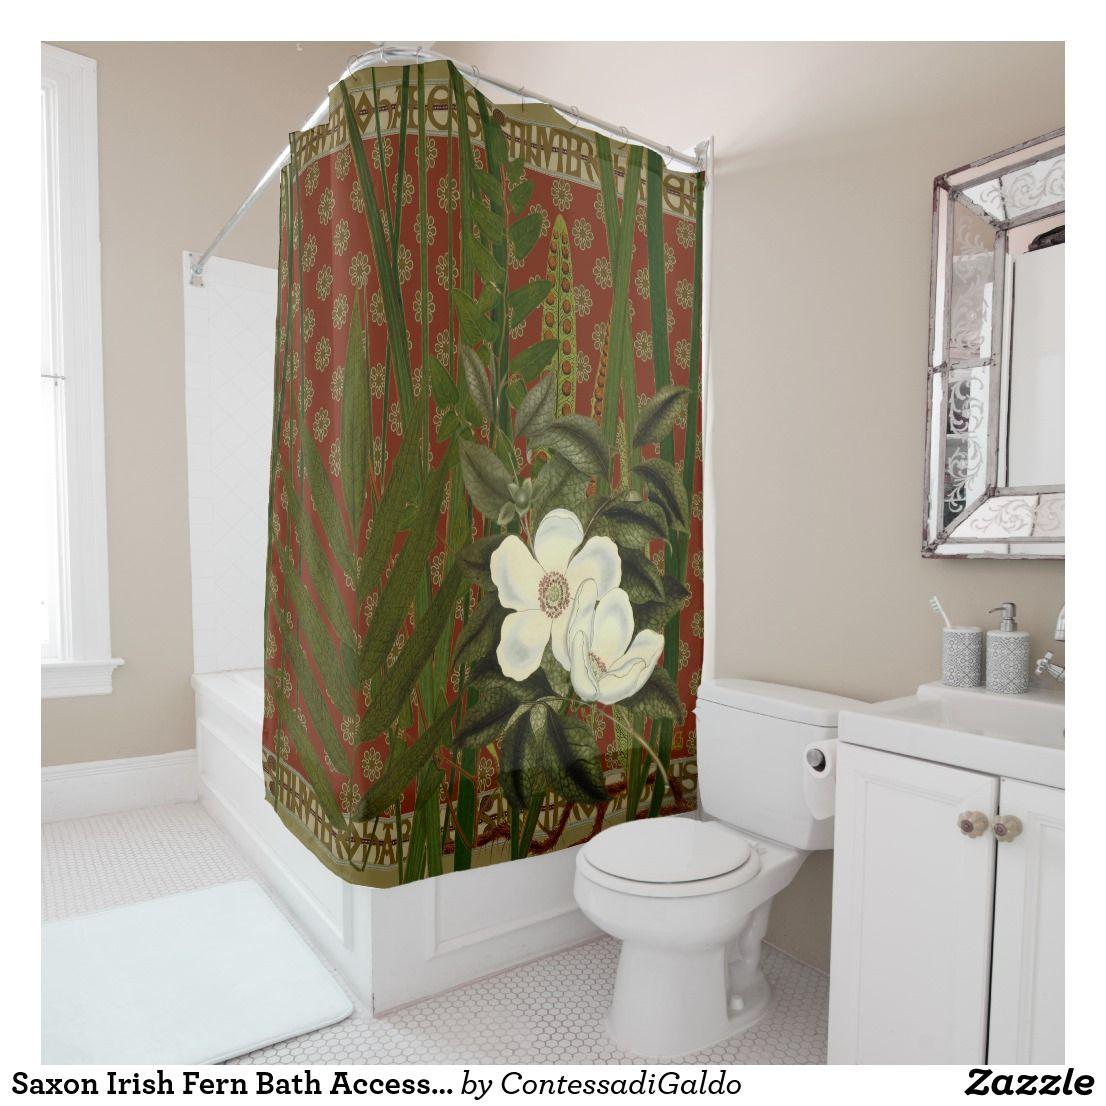 Saxon Irish Fern Bath Accessories Shower Curtains Zazzle